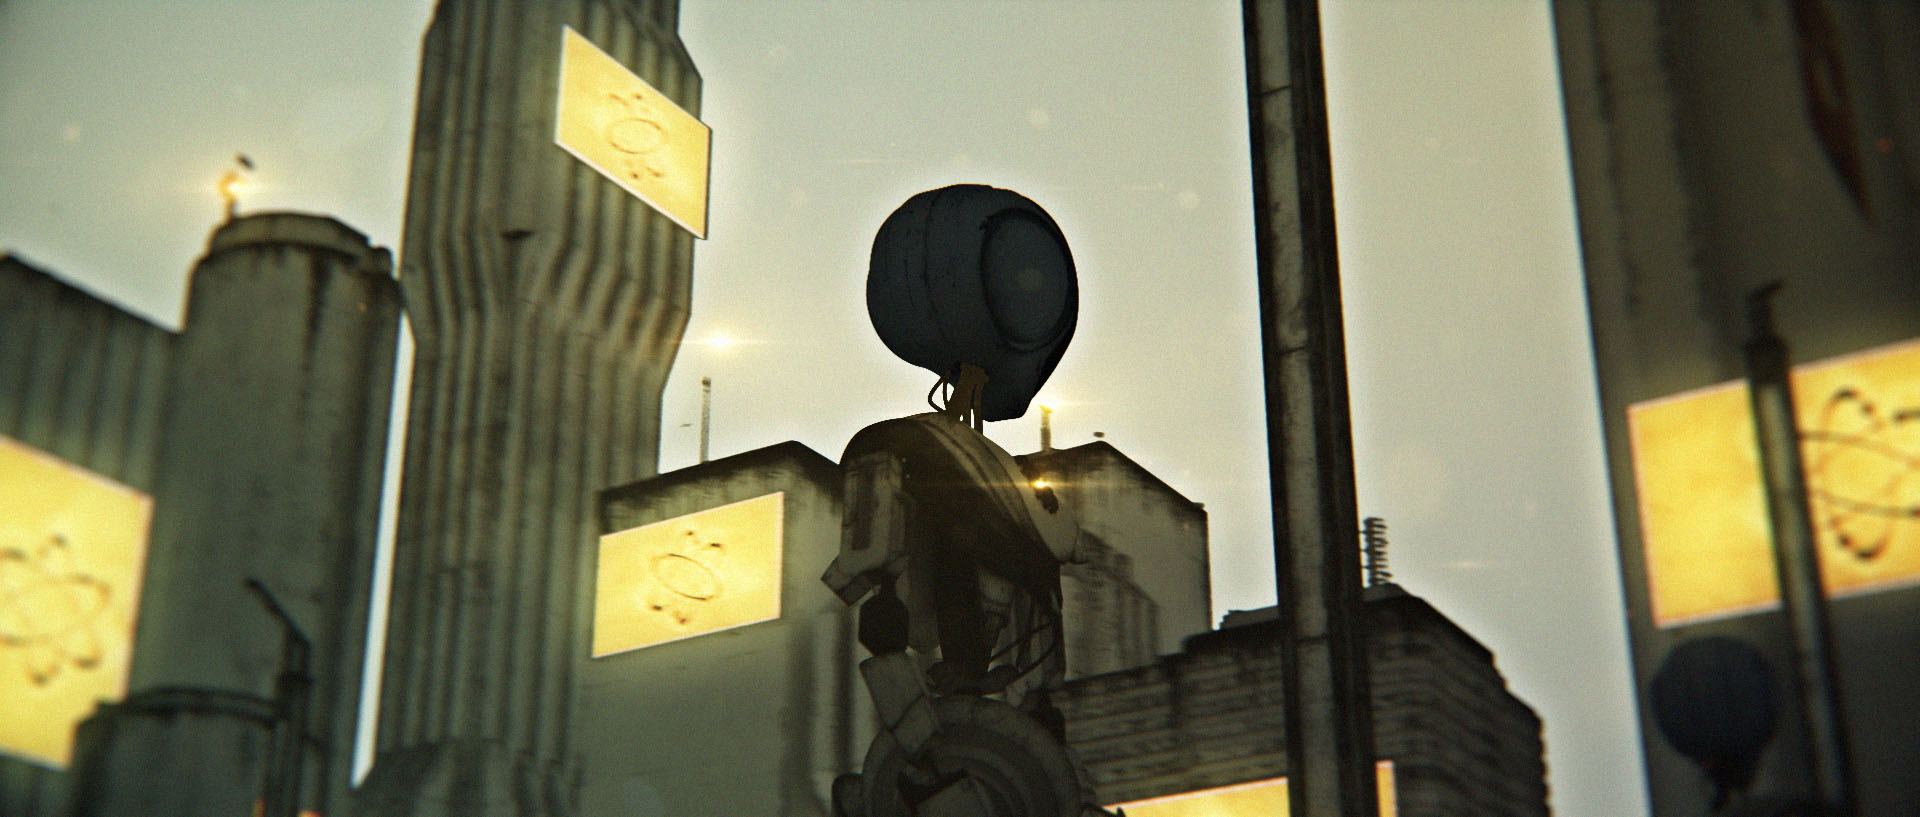 Sci-Fi-London_0020_21.jpg